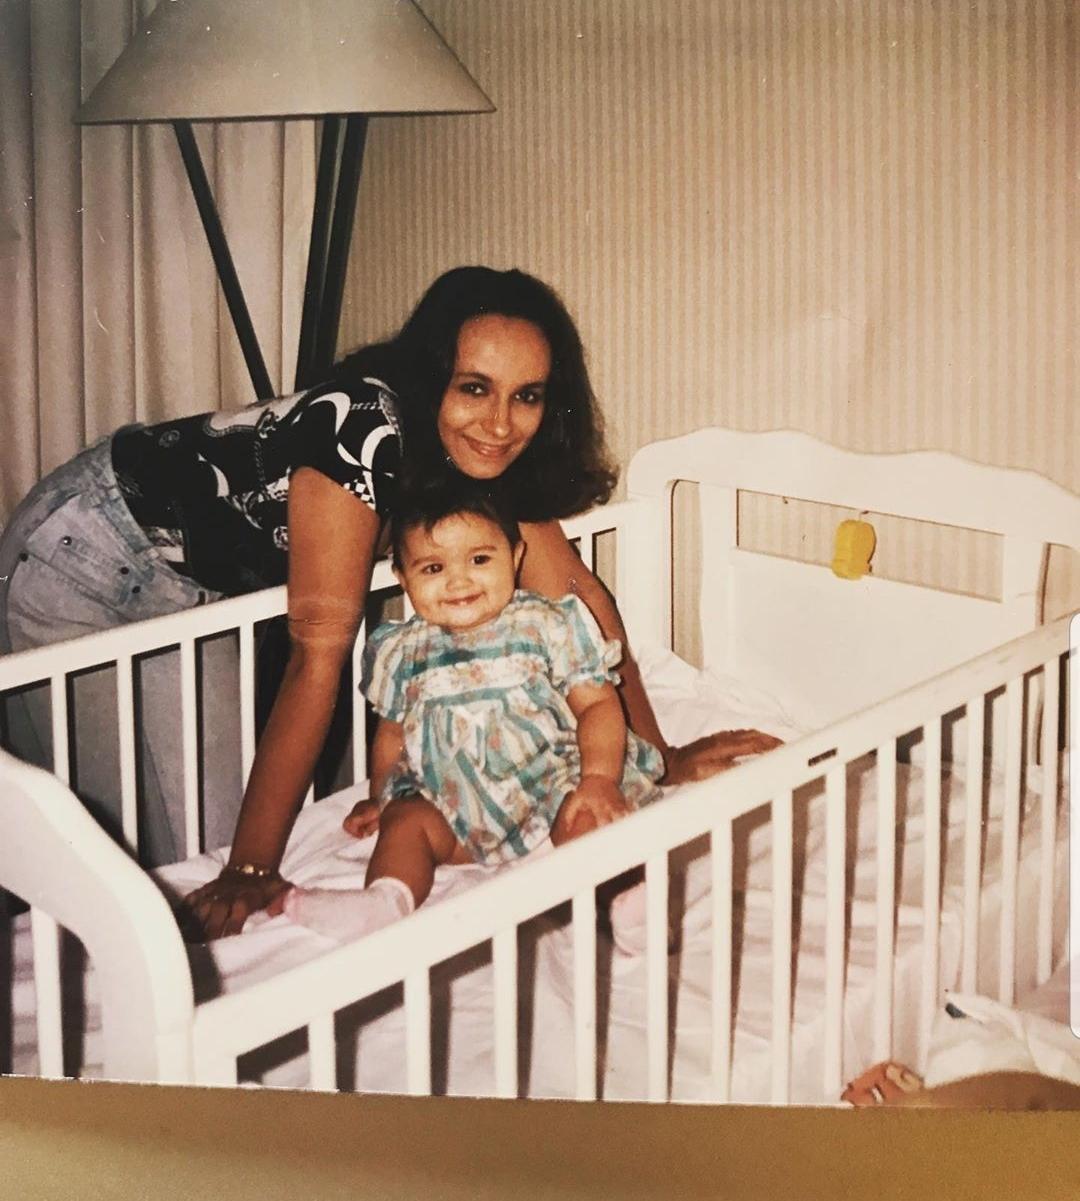 Soni Razdan with baby Alia Bhatt